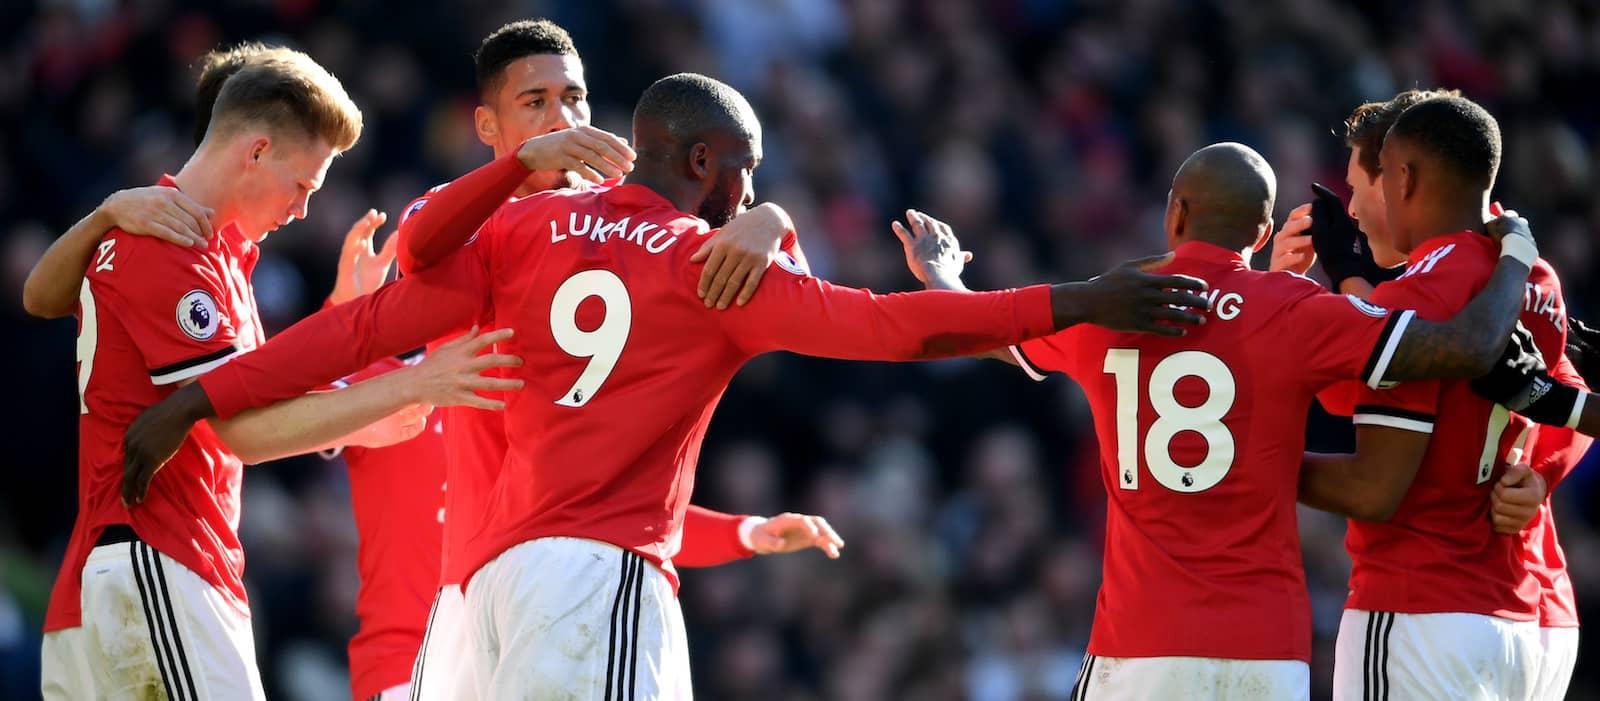 Manchester United vs Swansea City: Predicted XI